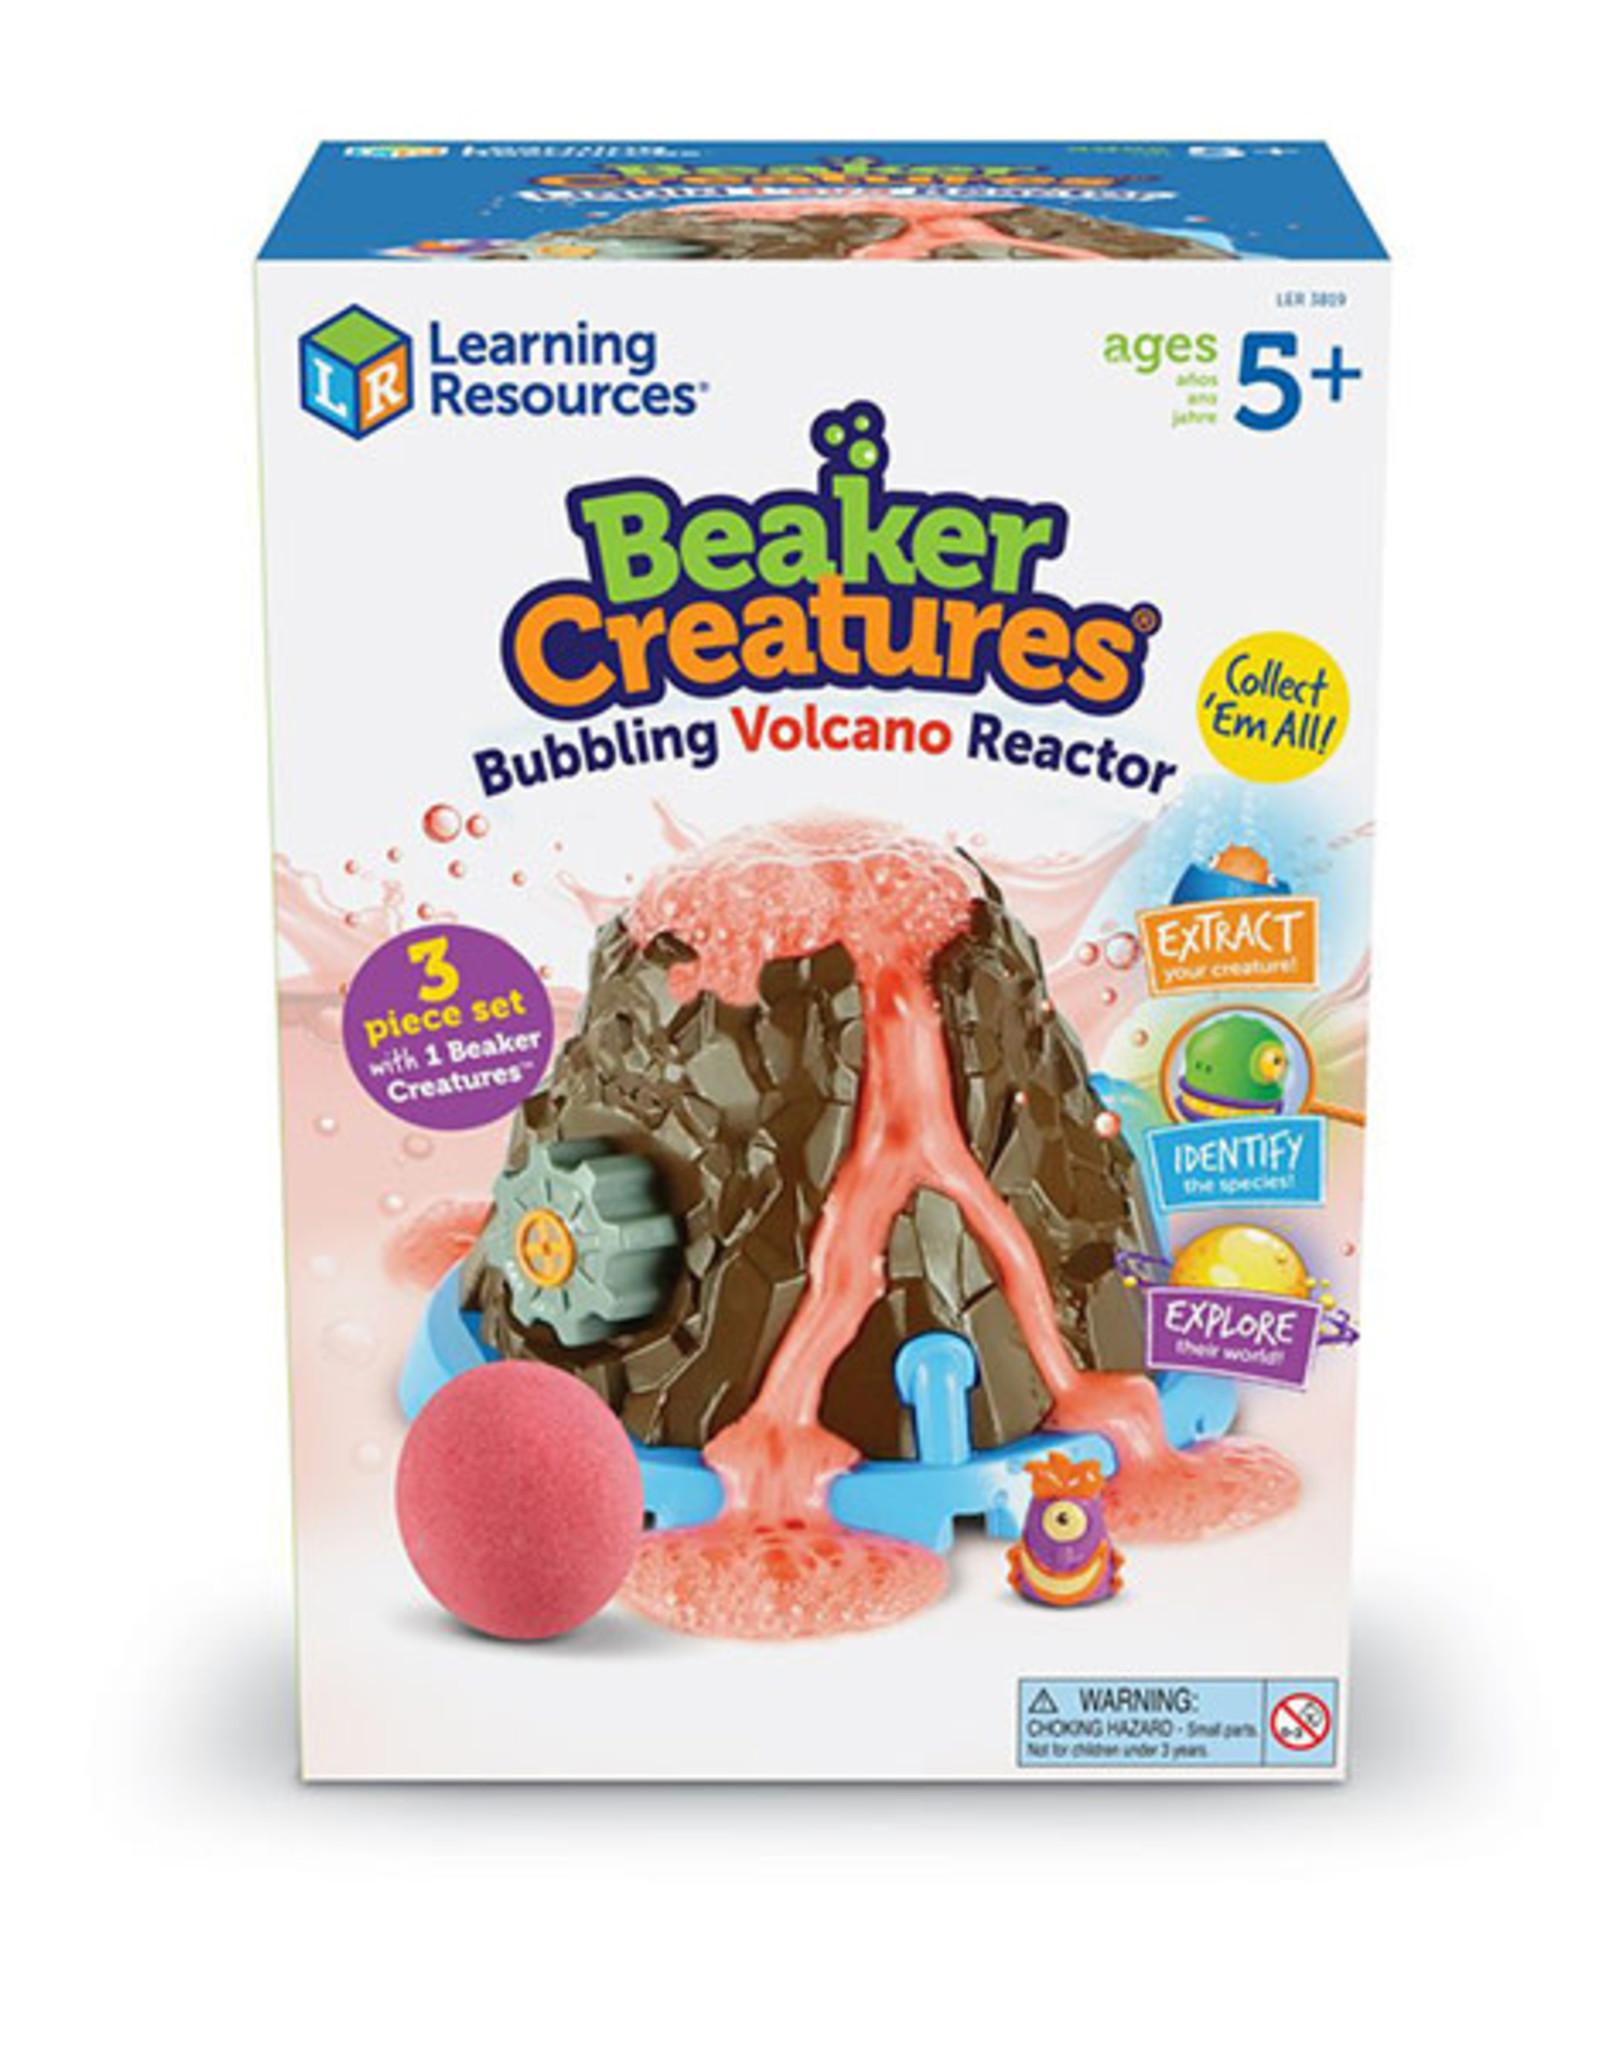 Learning Resources Beaker Creatures Series 3 Volcano